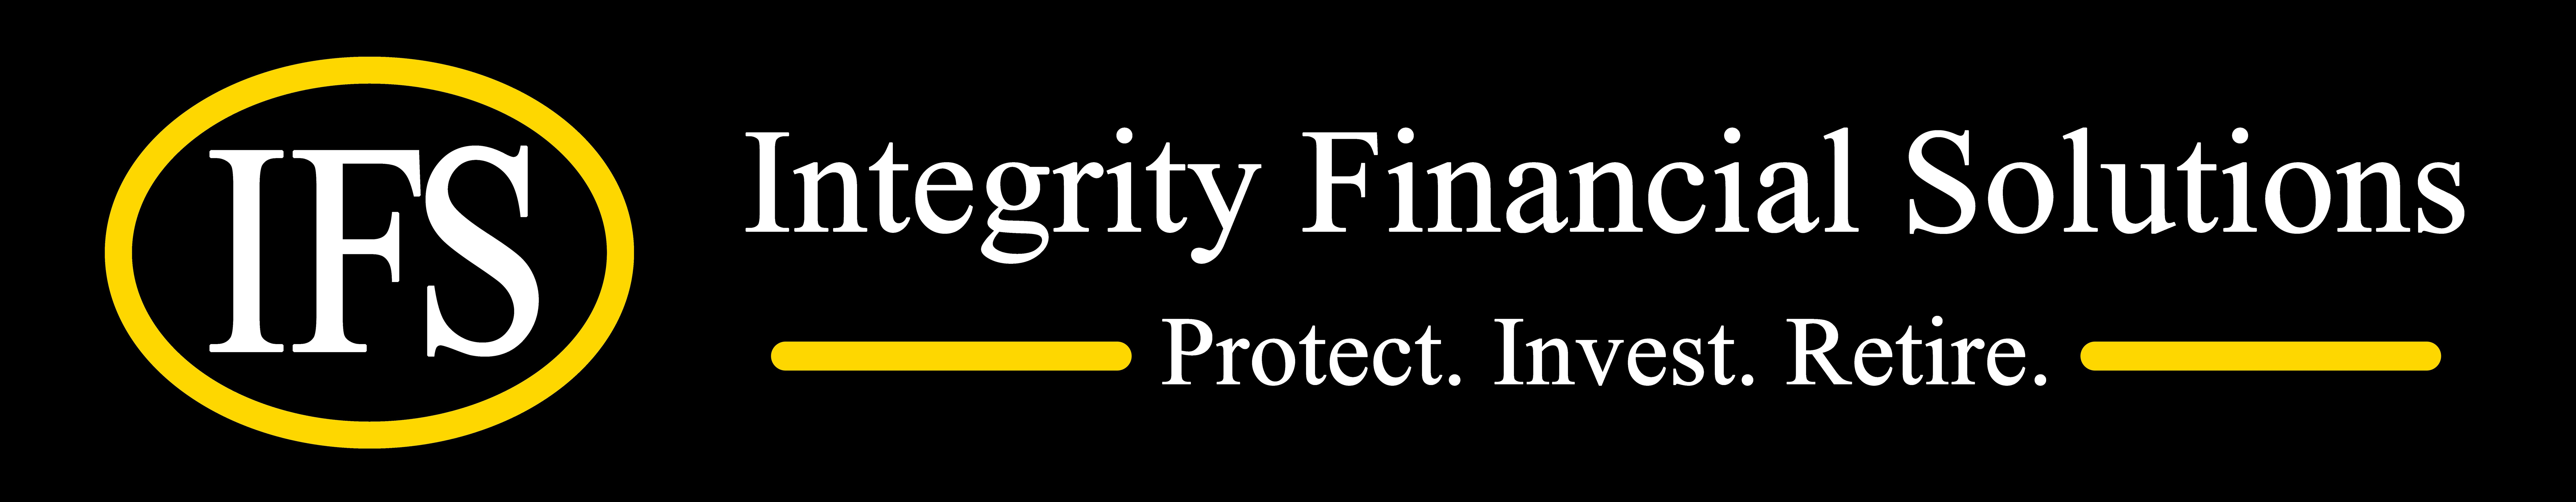 Integrity Financial